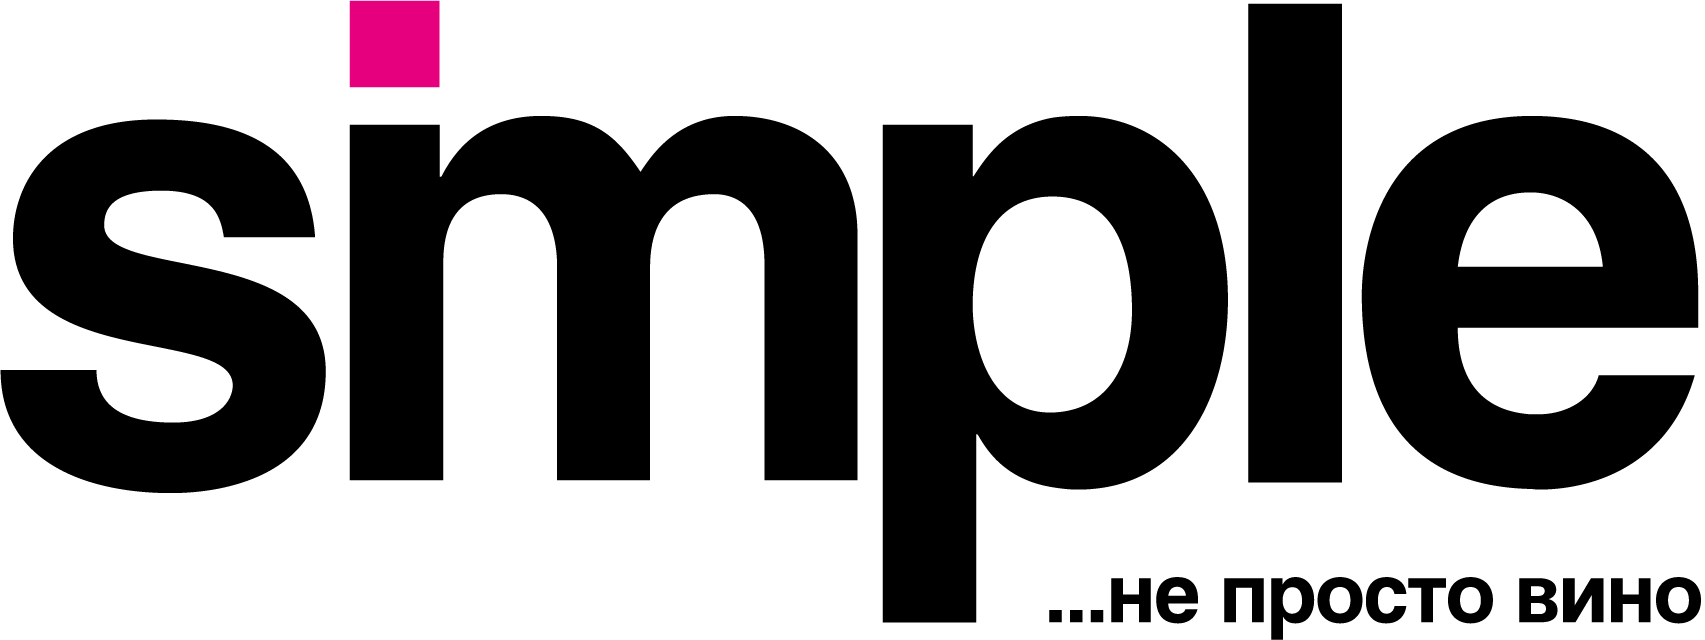 Группа компаний Simple